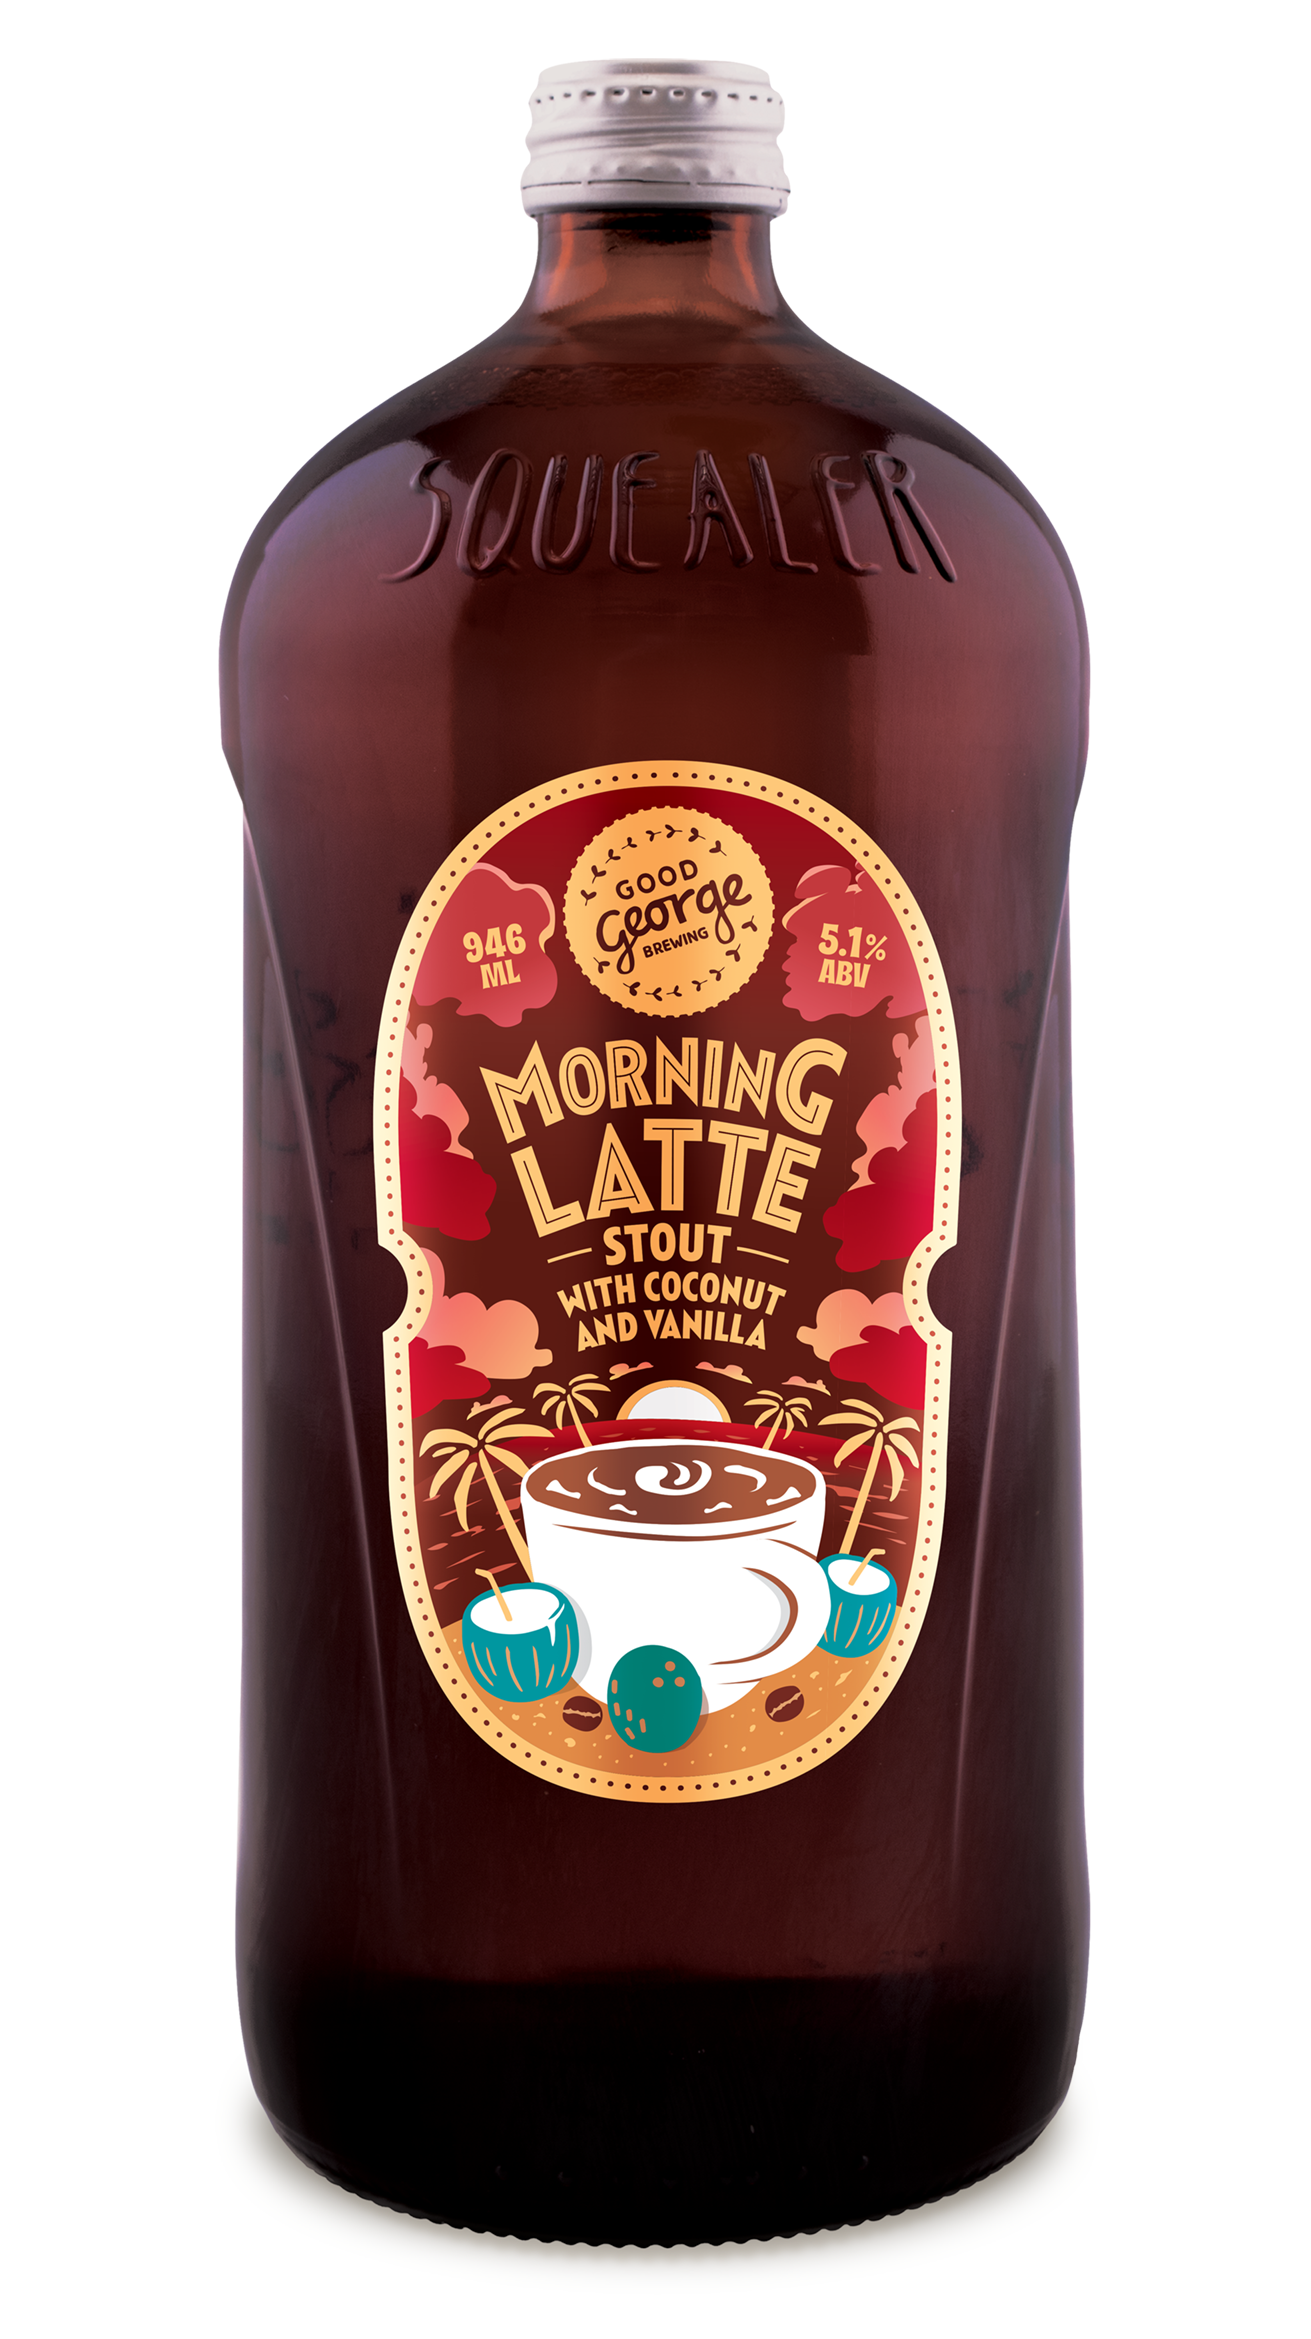 Good George Morning Latte Stout Squealer